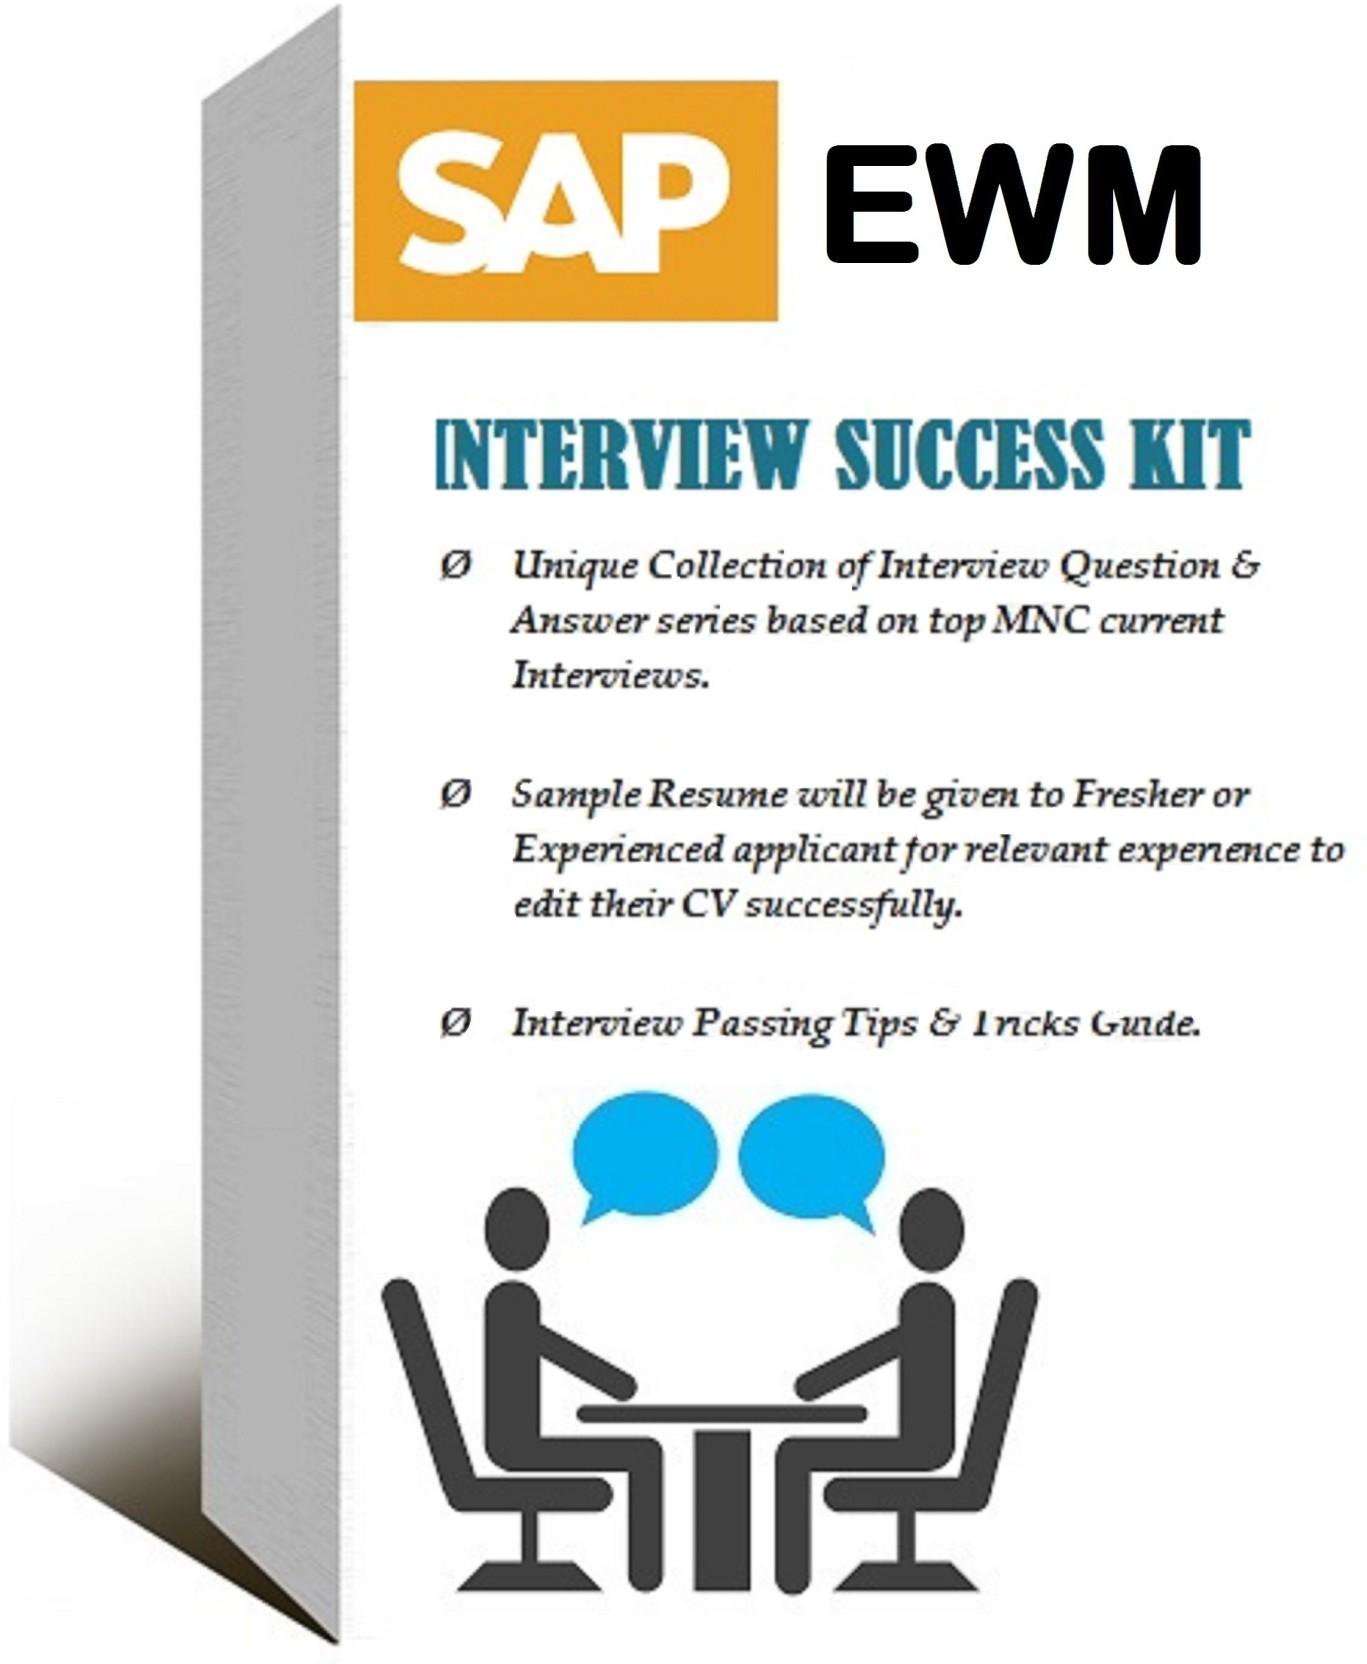 sapsmart SAP EWM ONLINE VIDEO (SELF-LEARNING) INTERVIEW SUCCESS KIT ...